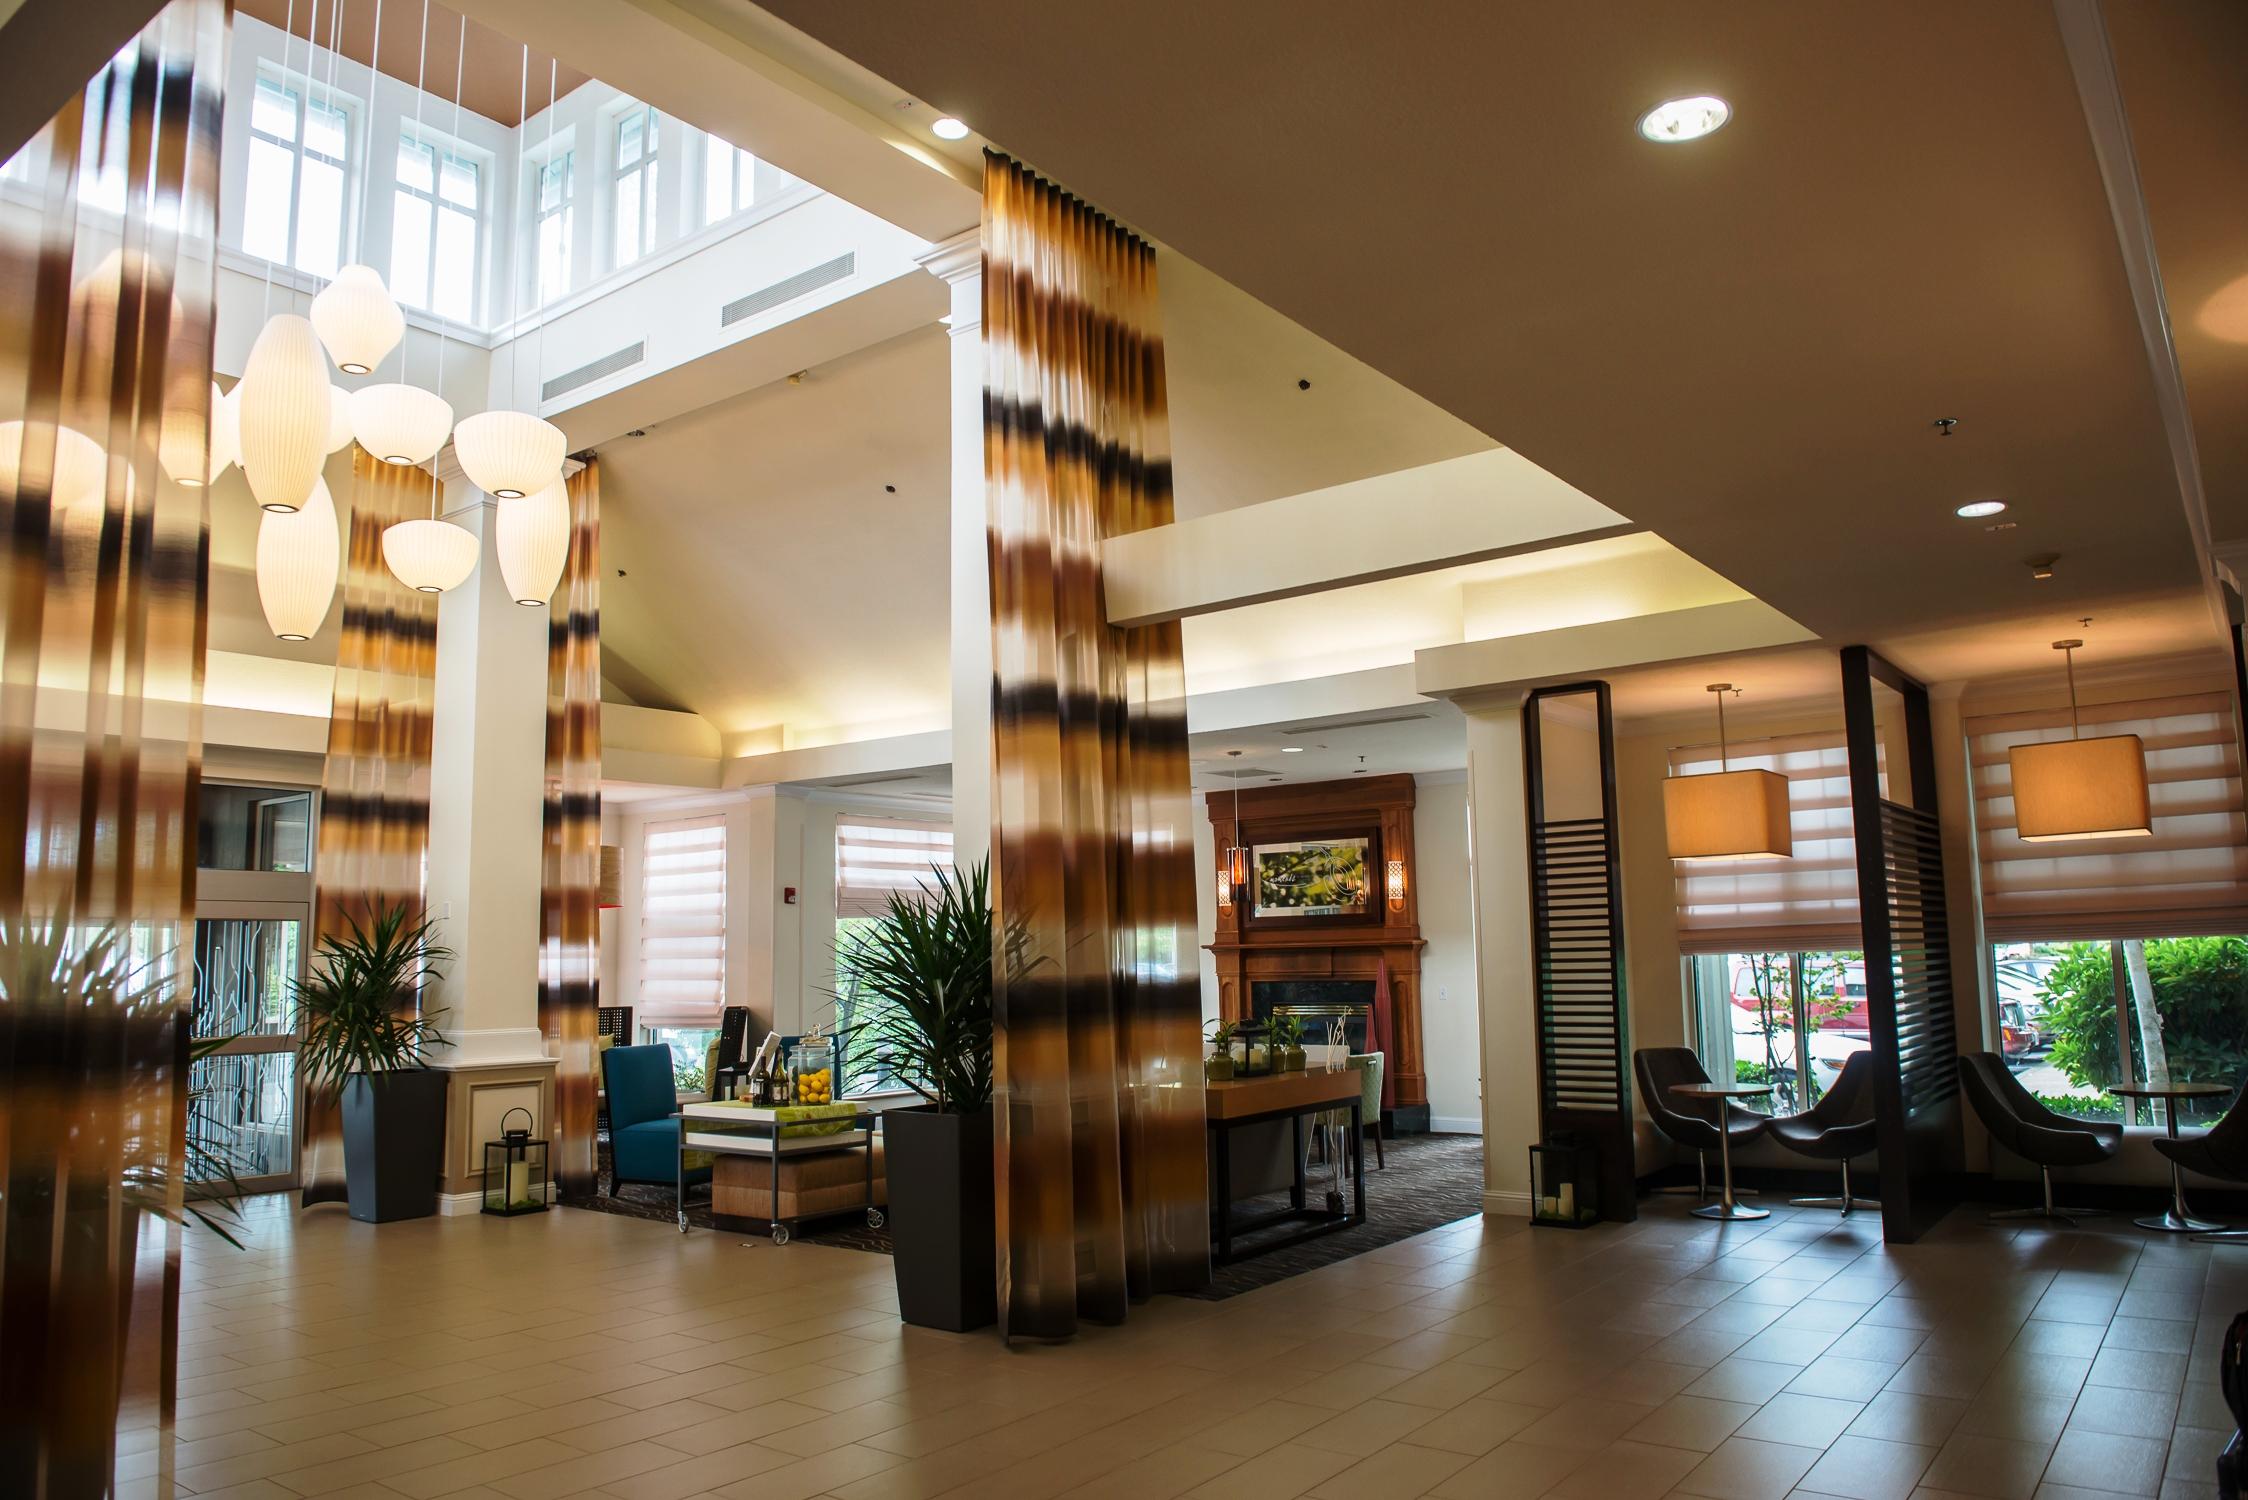 hilton garden inn portland airport in portland or. Black Bedroom Furniture Sets. Home Design Ideas